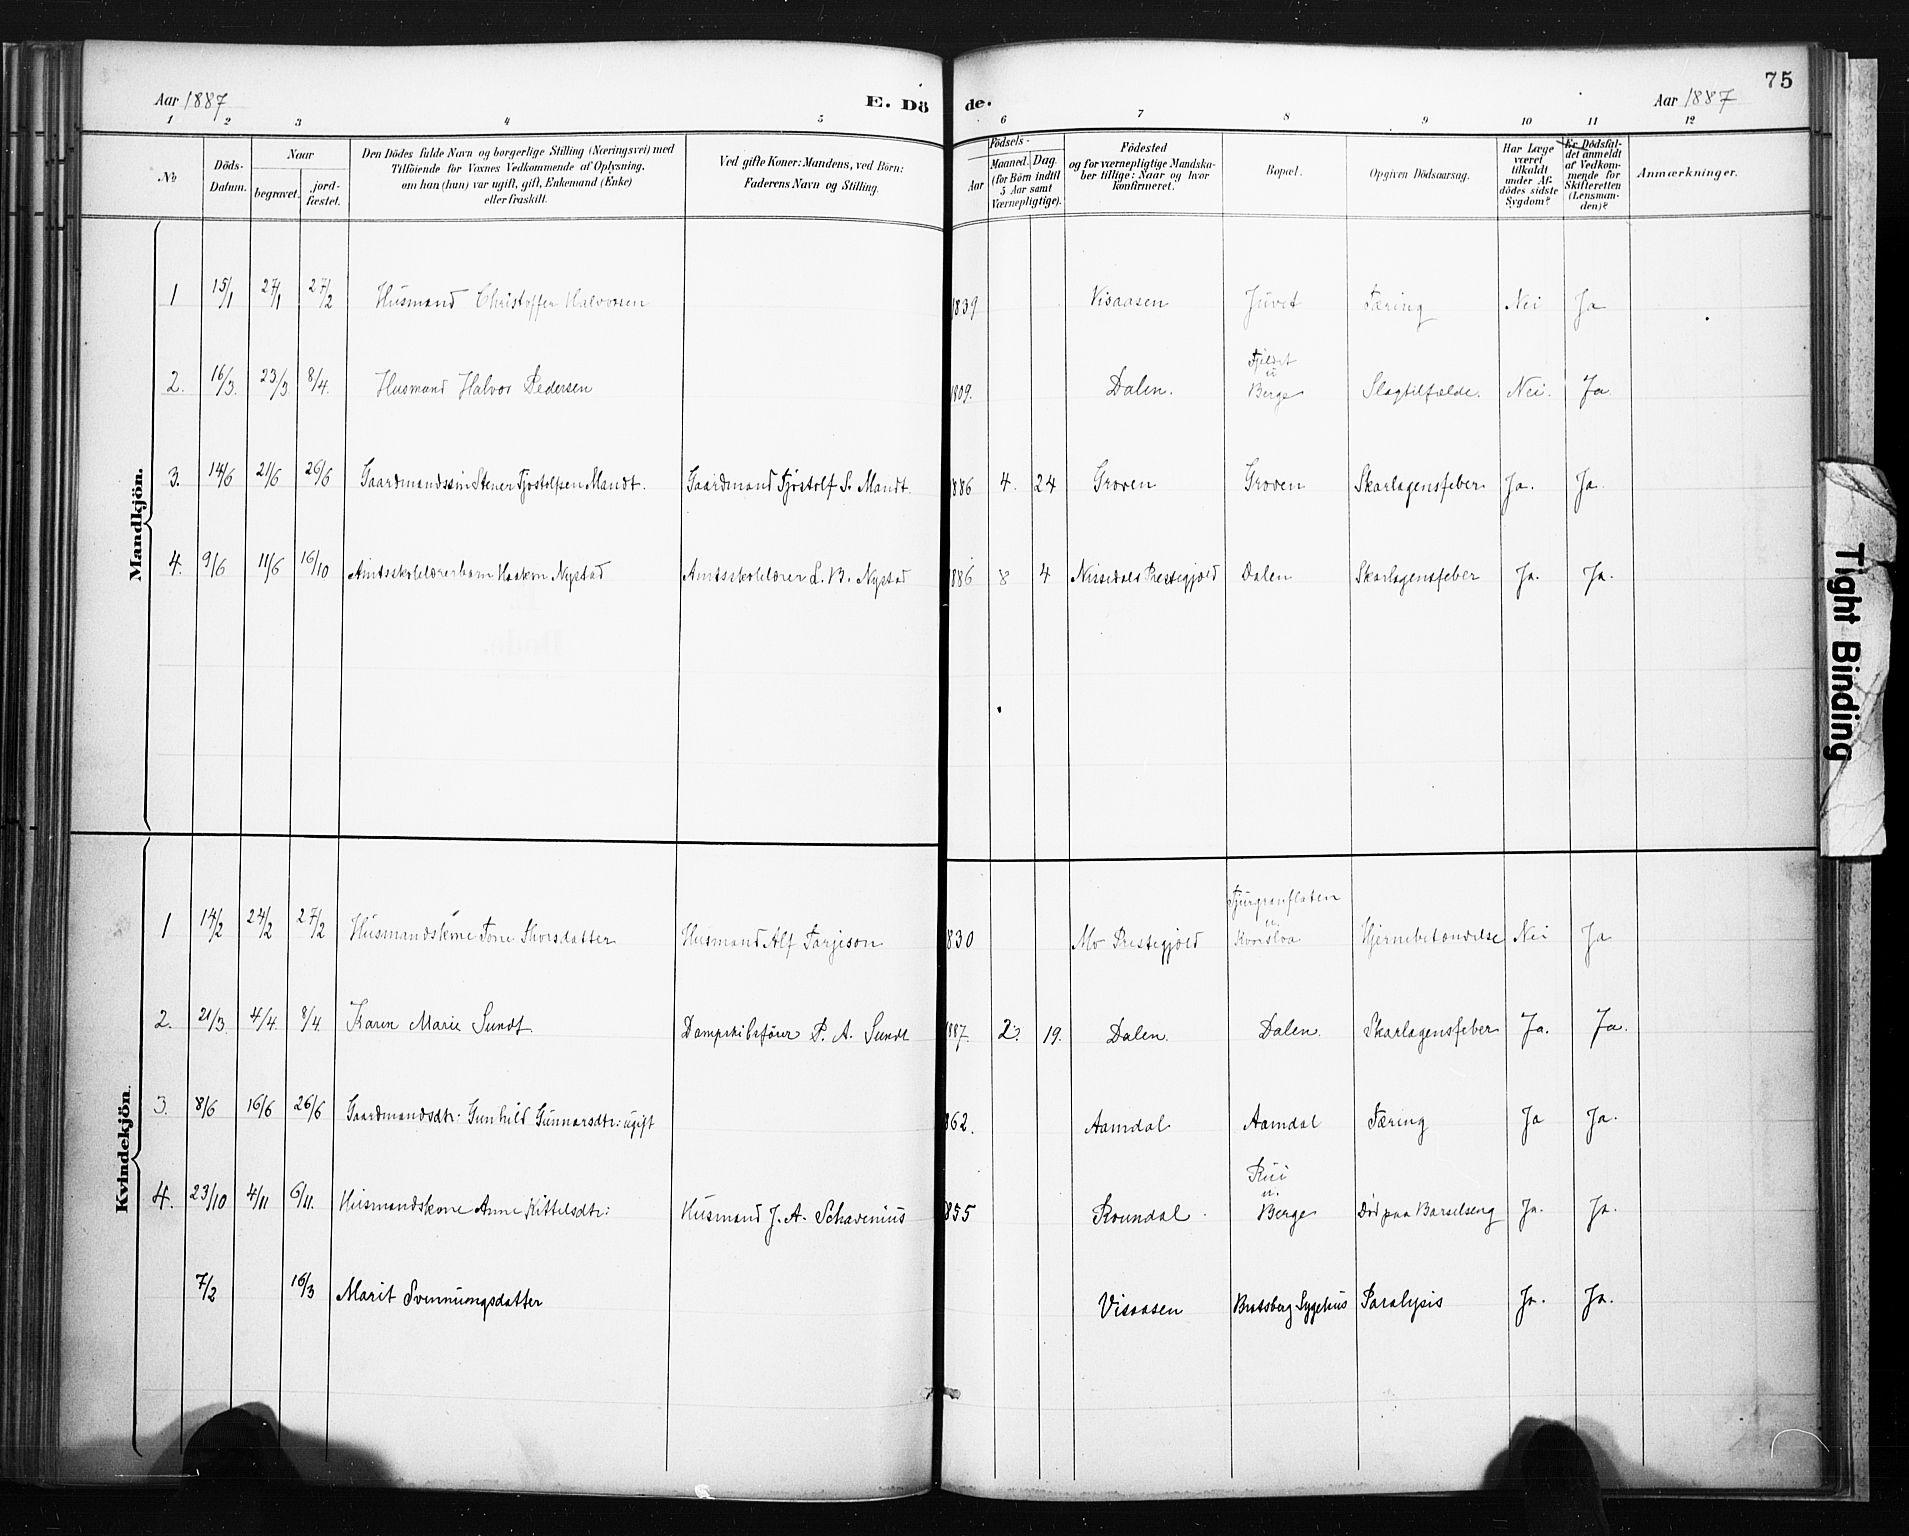 SAKO, Lårdal kirkebøker, F/Fb/L0002: Ministerialbok nr. II 2, 1887-1918, s. 75